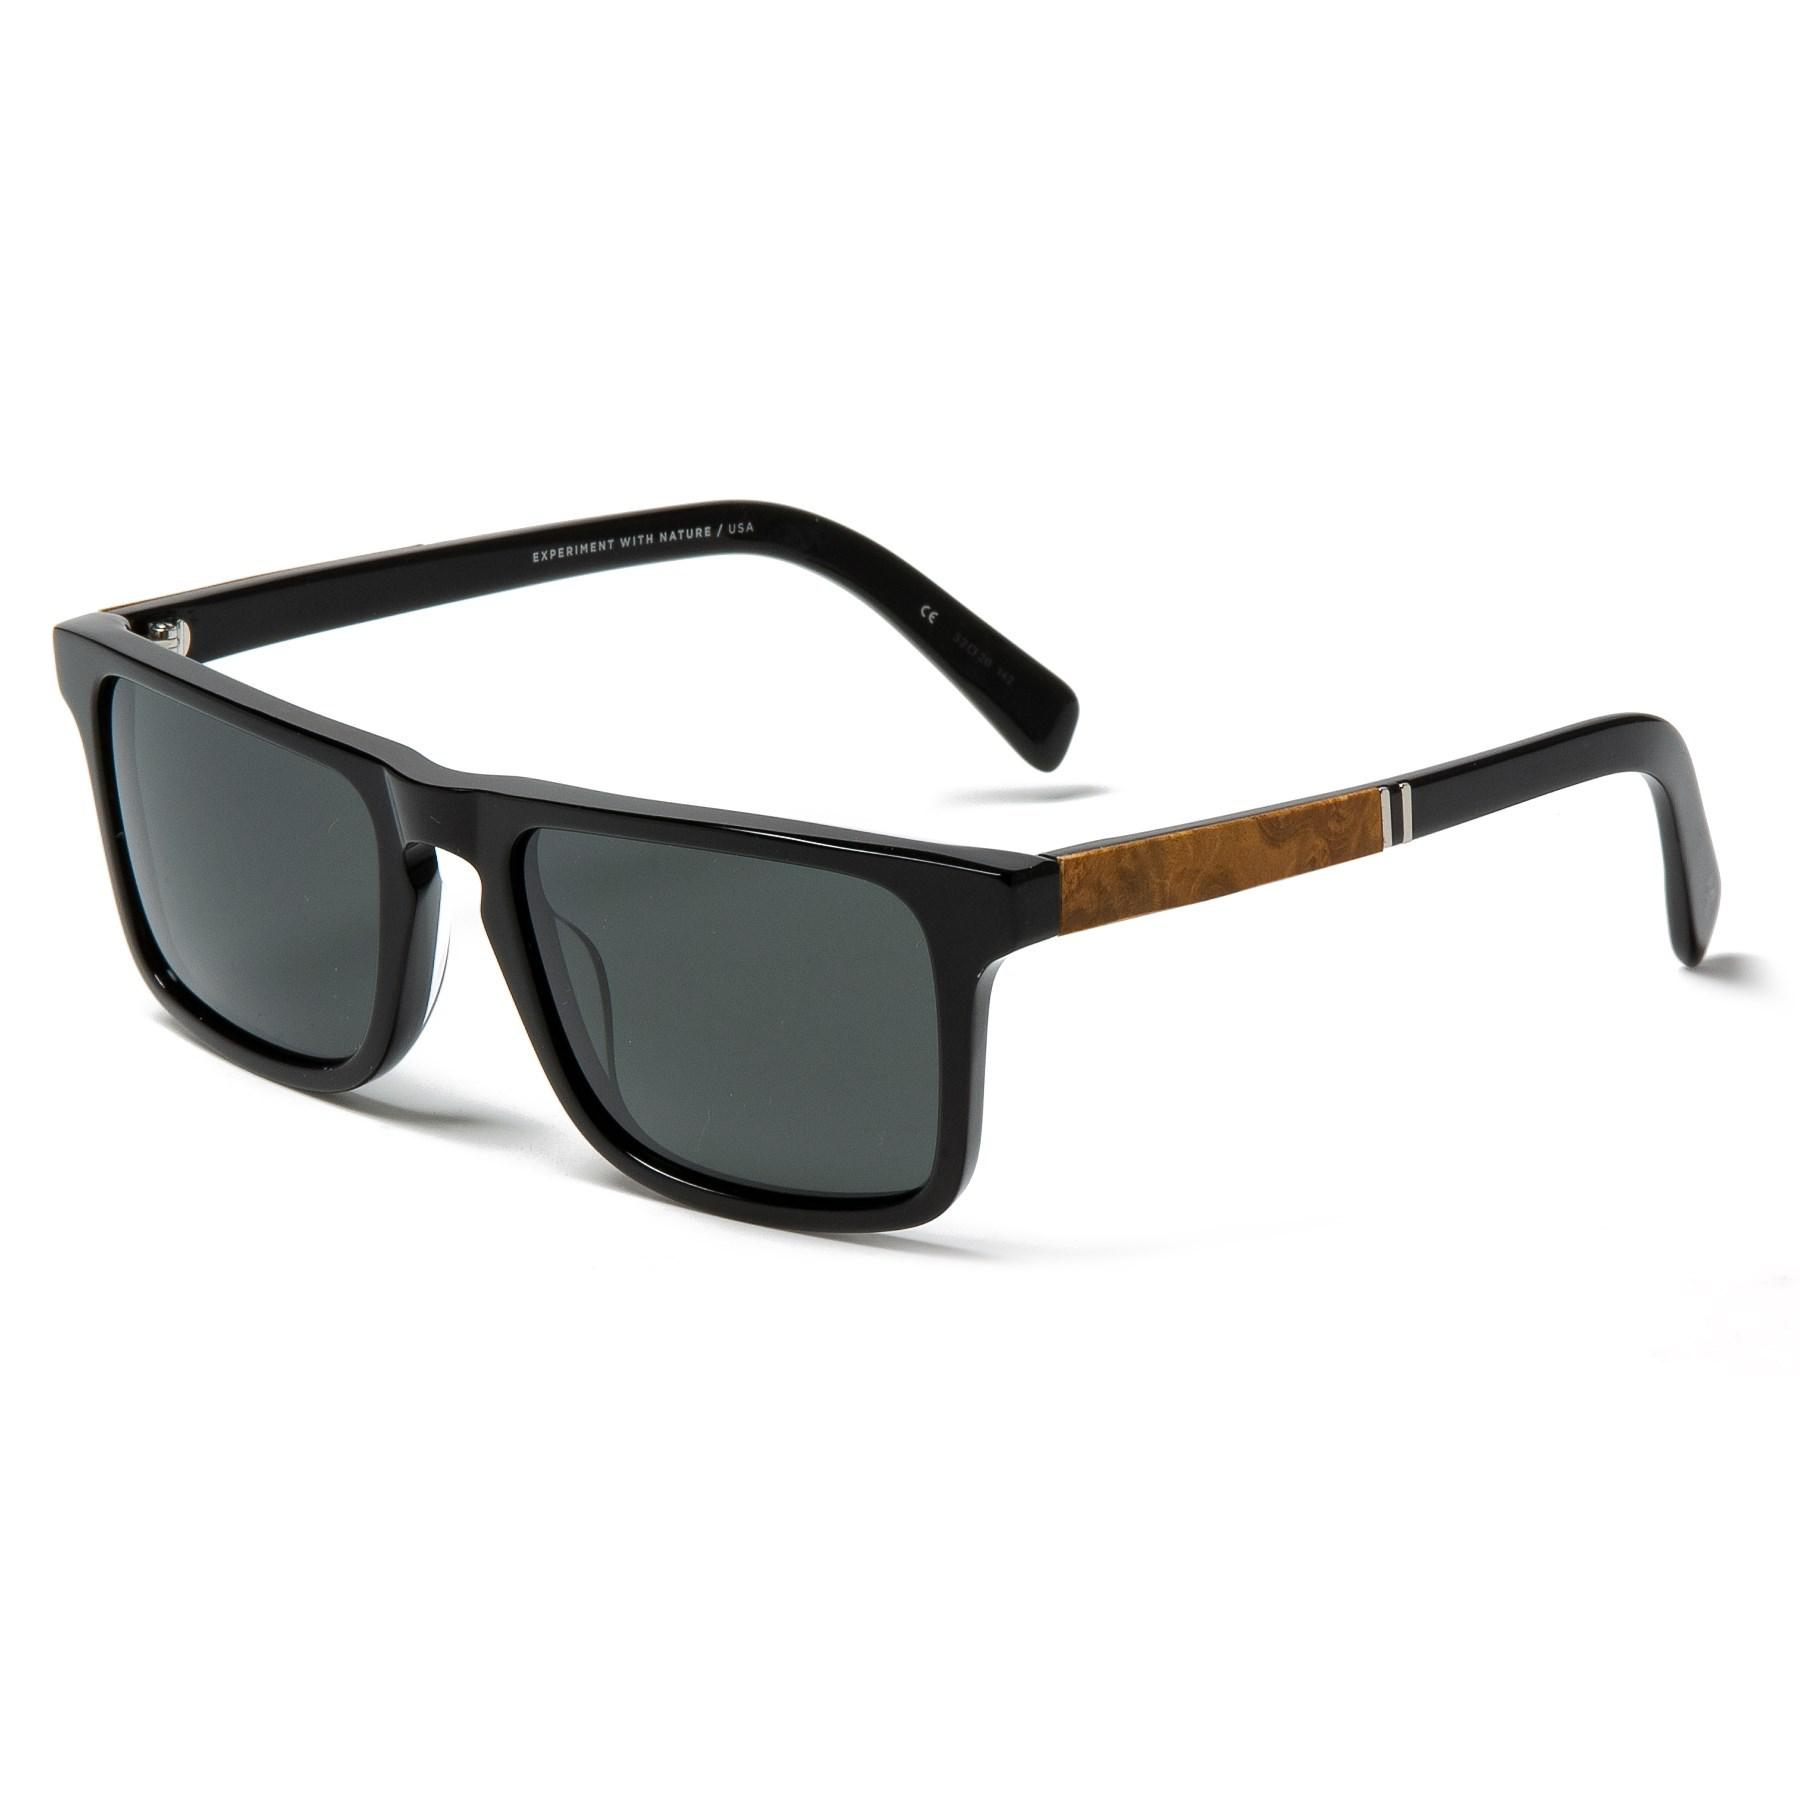 9d8f25175c Lyst - Shwood Govy 2 Sunglasses in Black